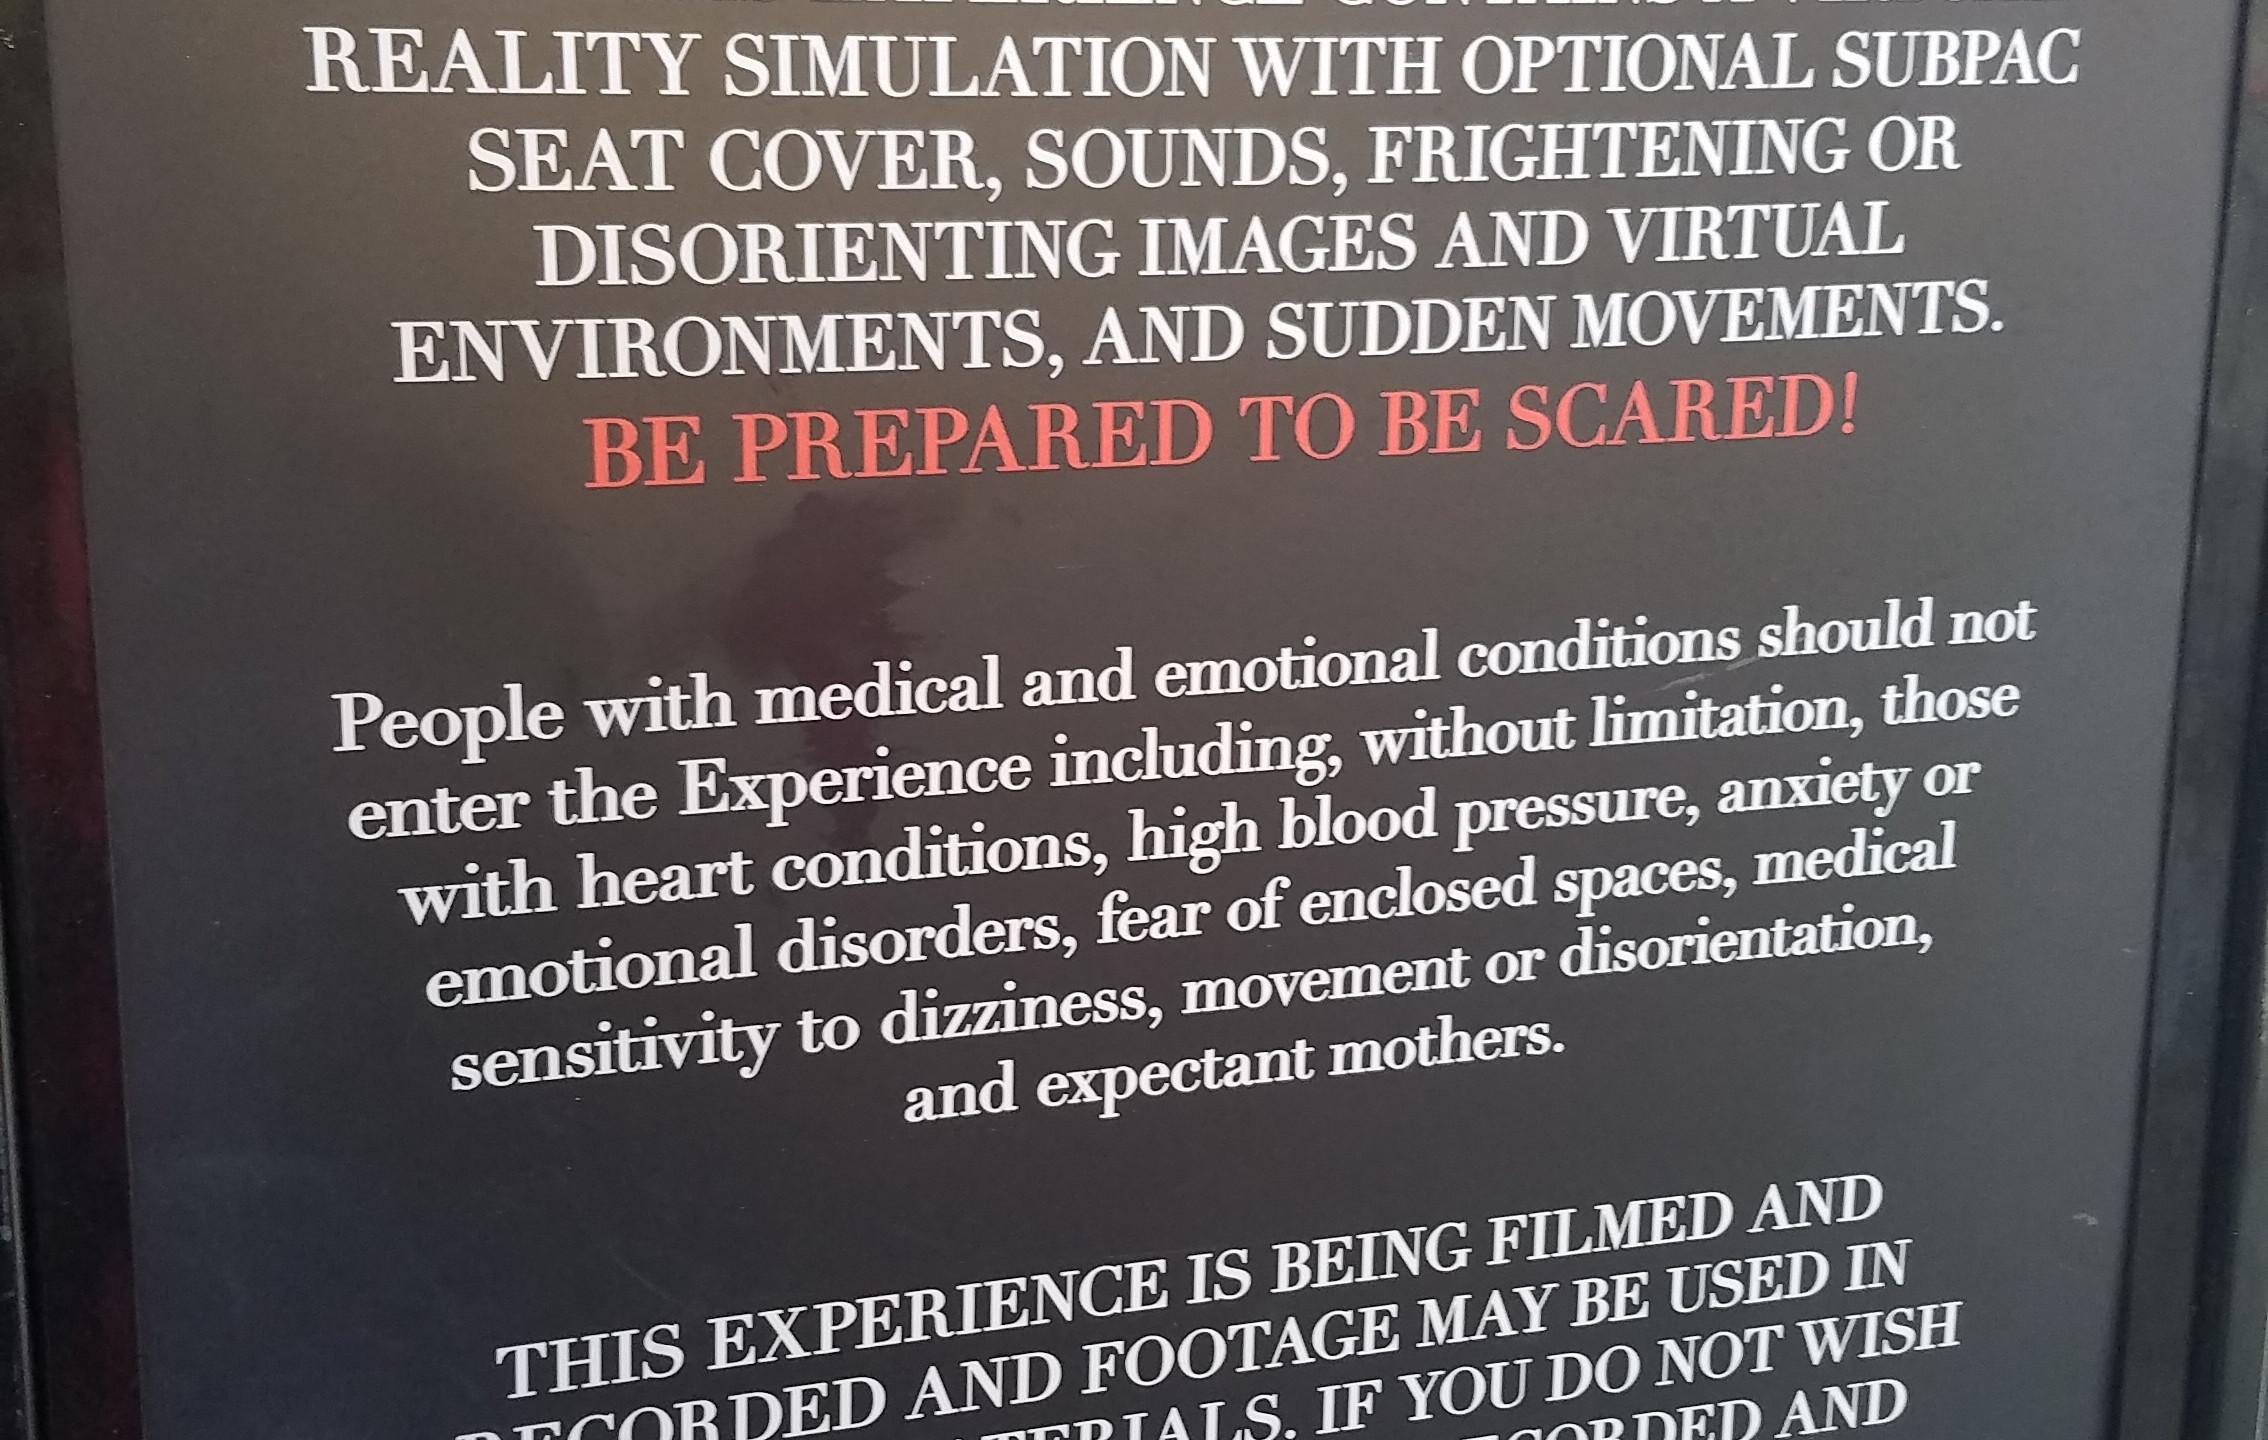 Description of experience